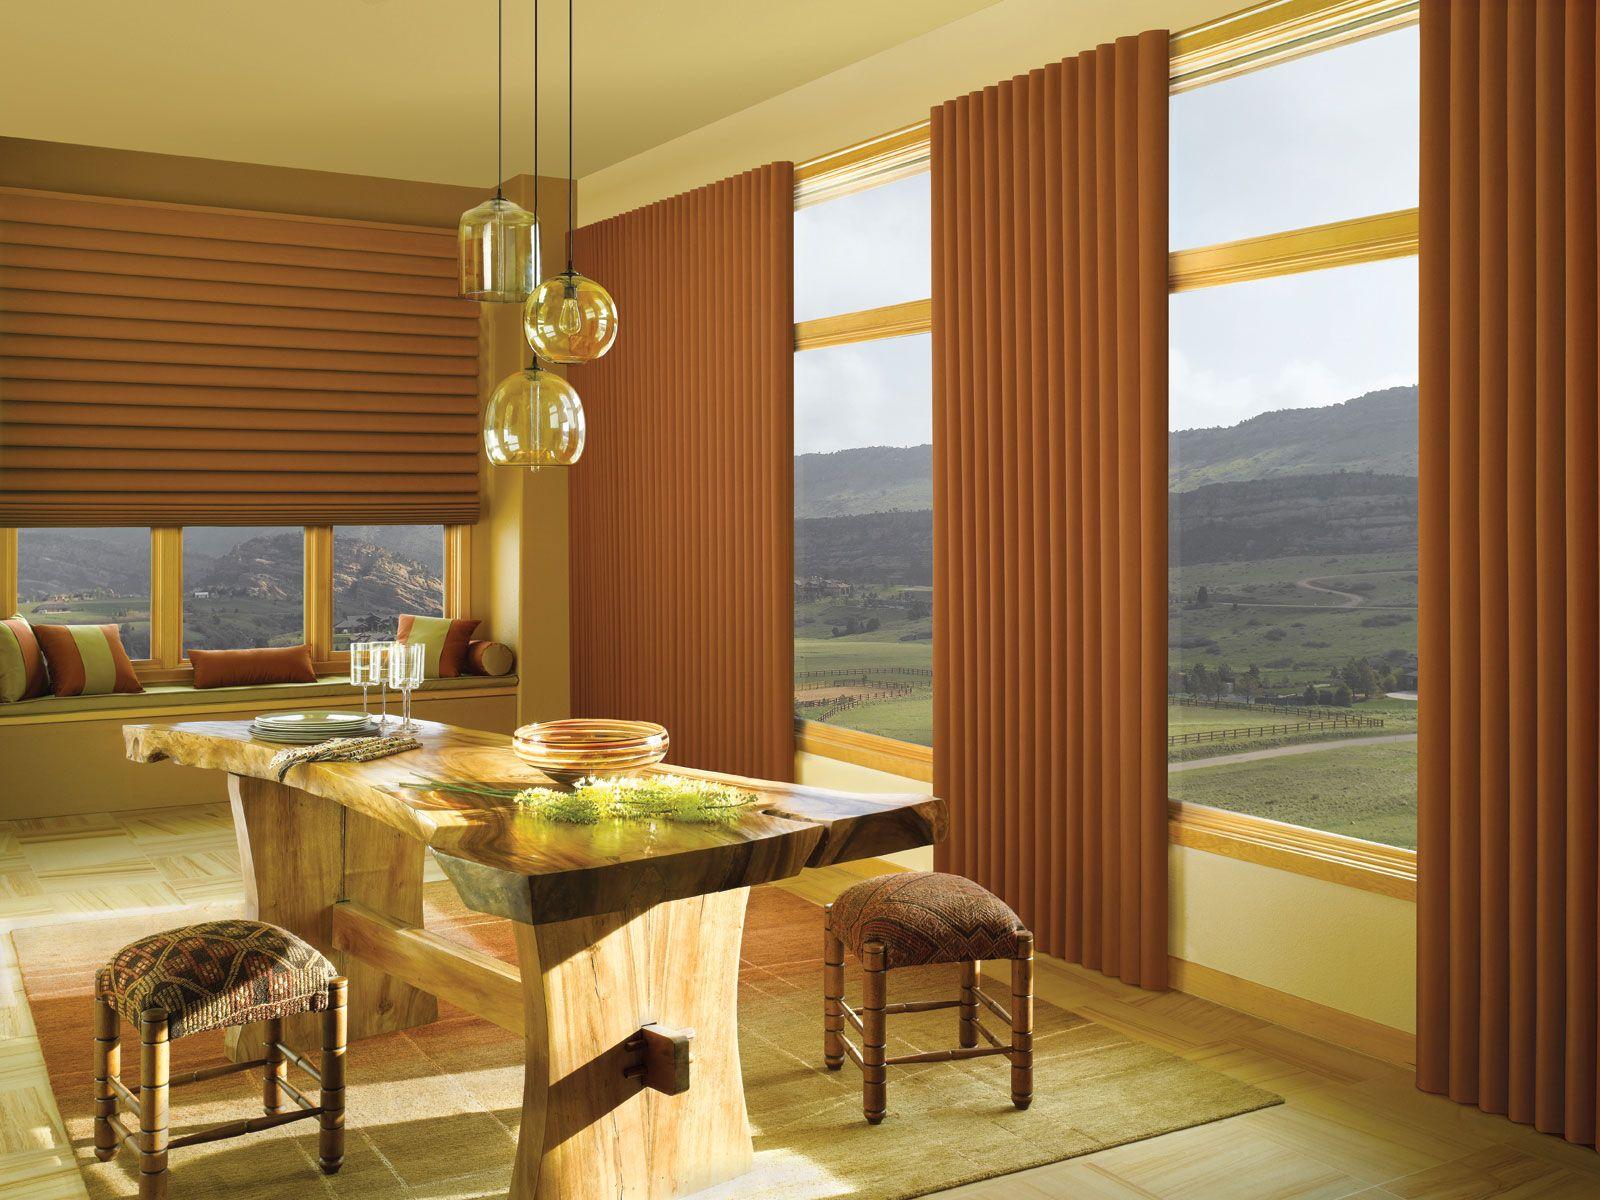 Vignette Traversed Vertiglide Dining Room Window Treatments Dining Room Colors Dining Room Windows